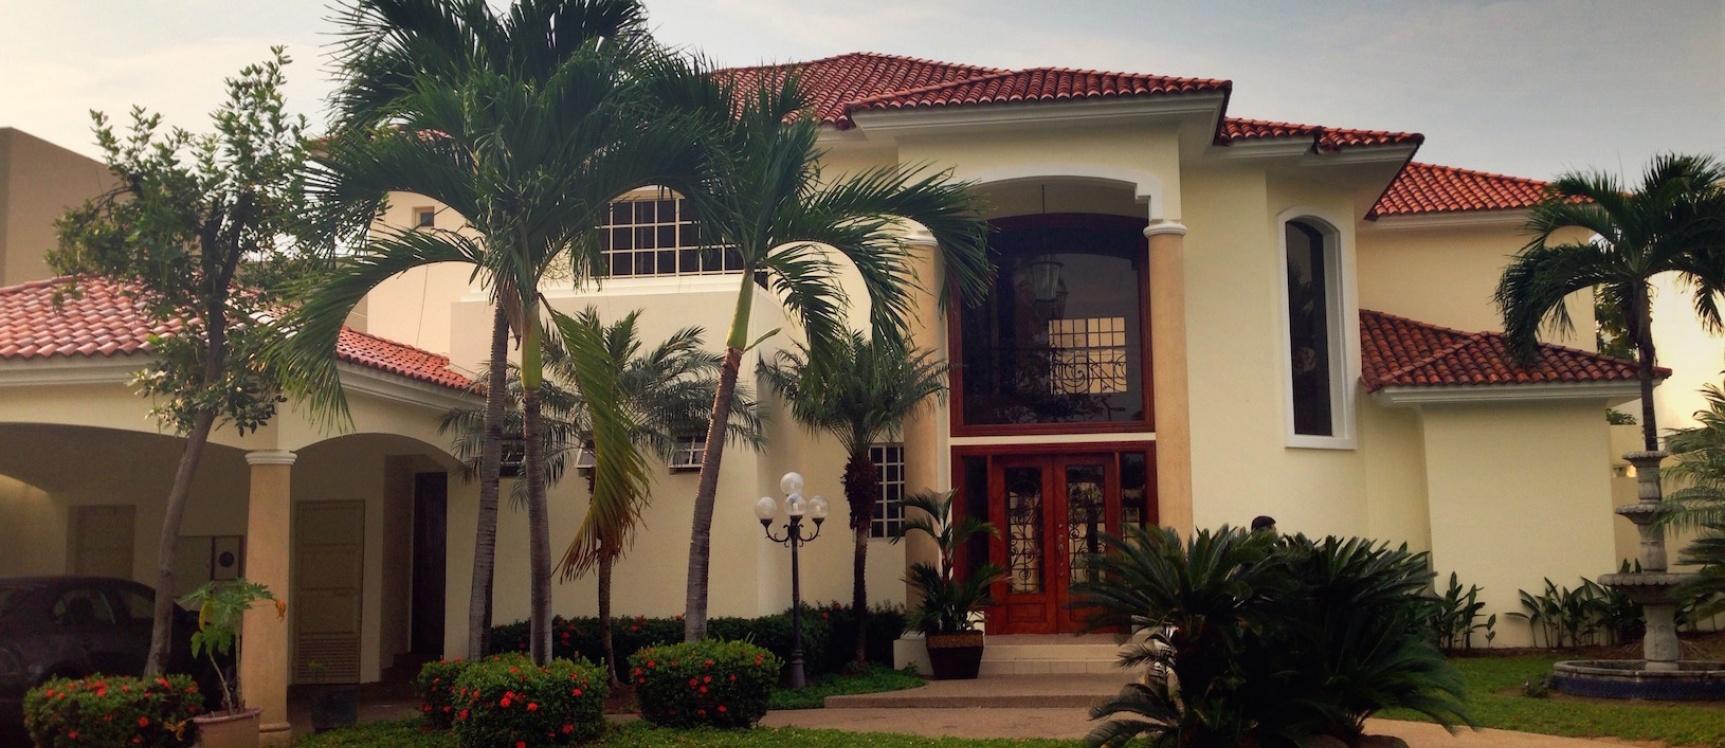 Casa de venta en samborond n urbanizaci n lago sol de for Casas con piscina guayaquil